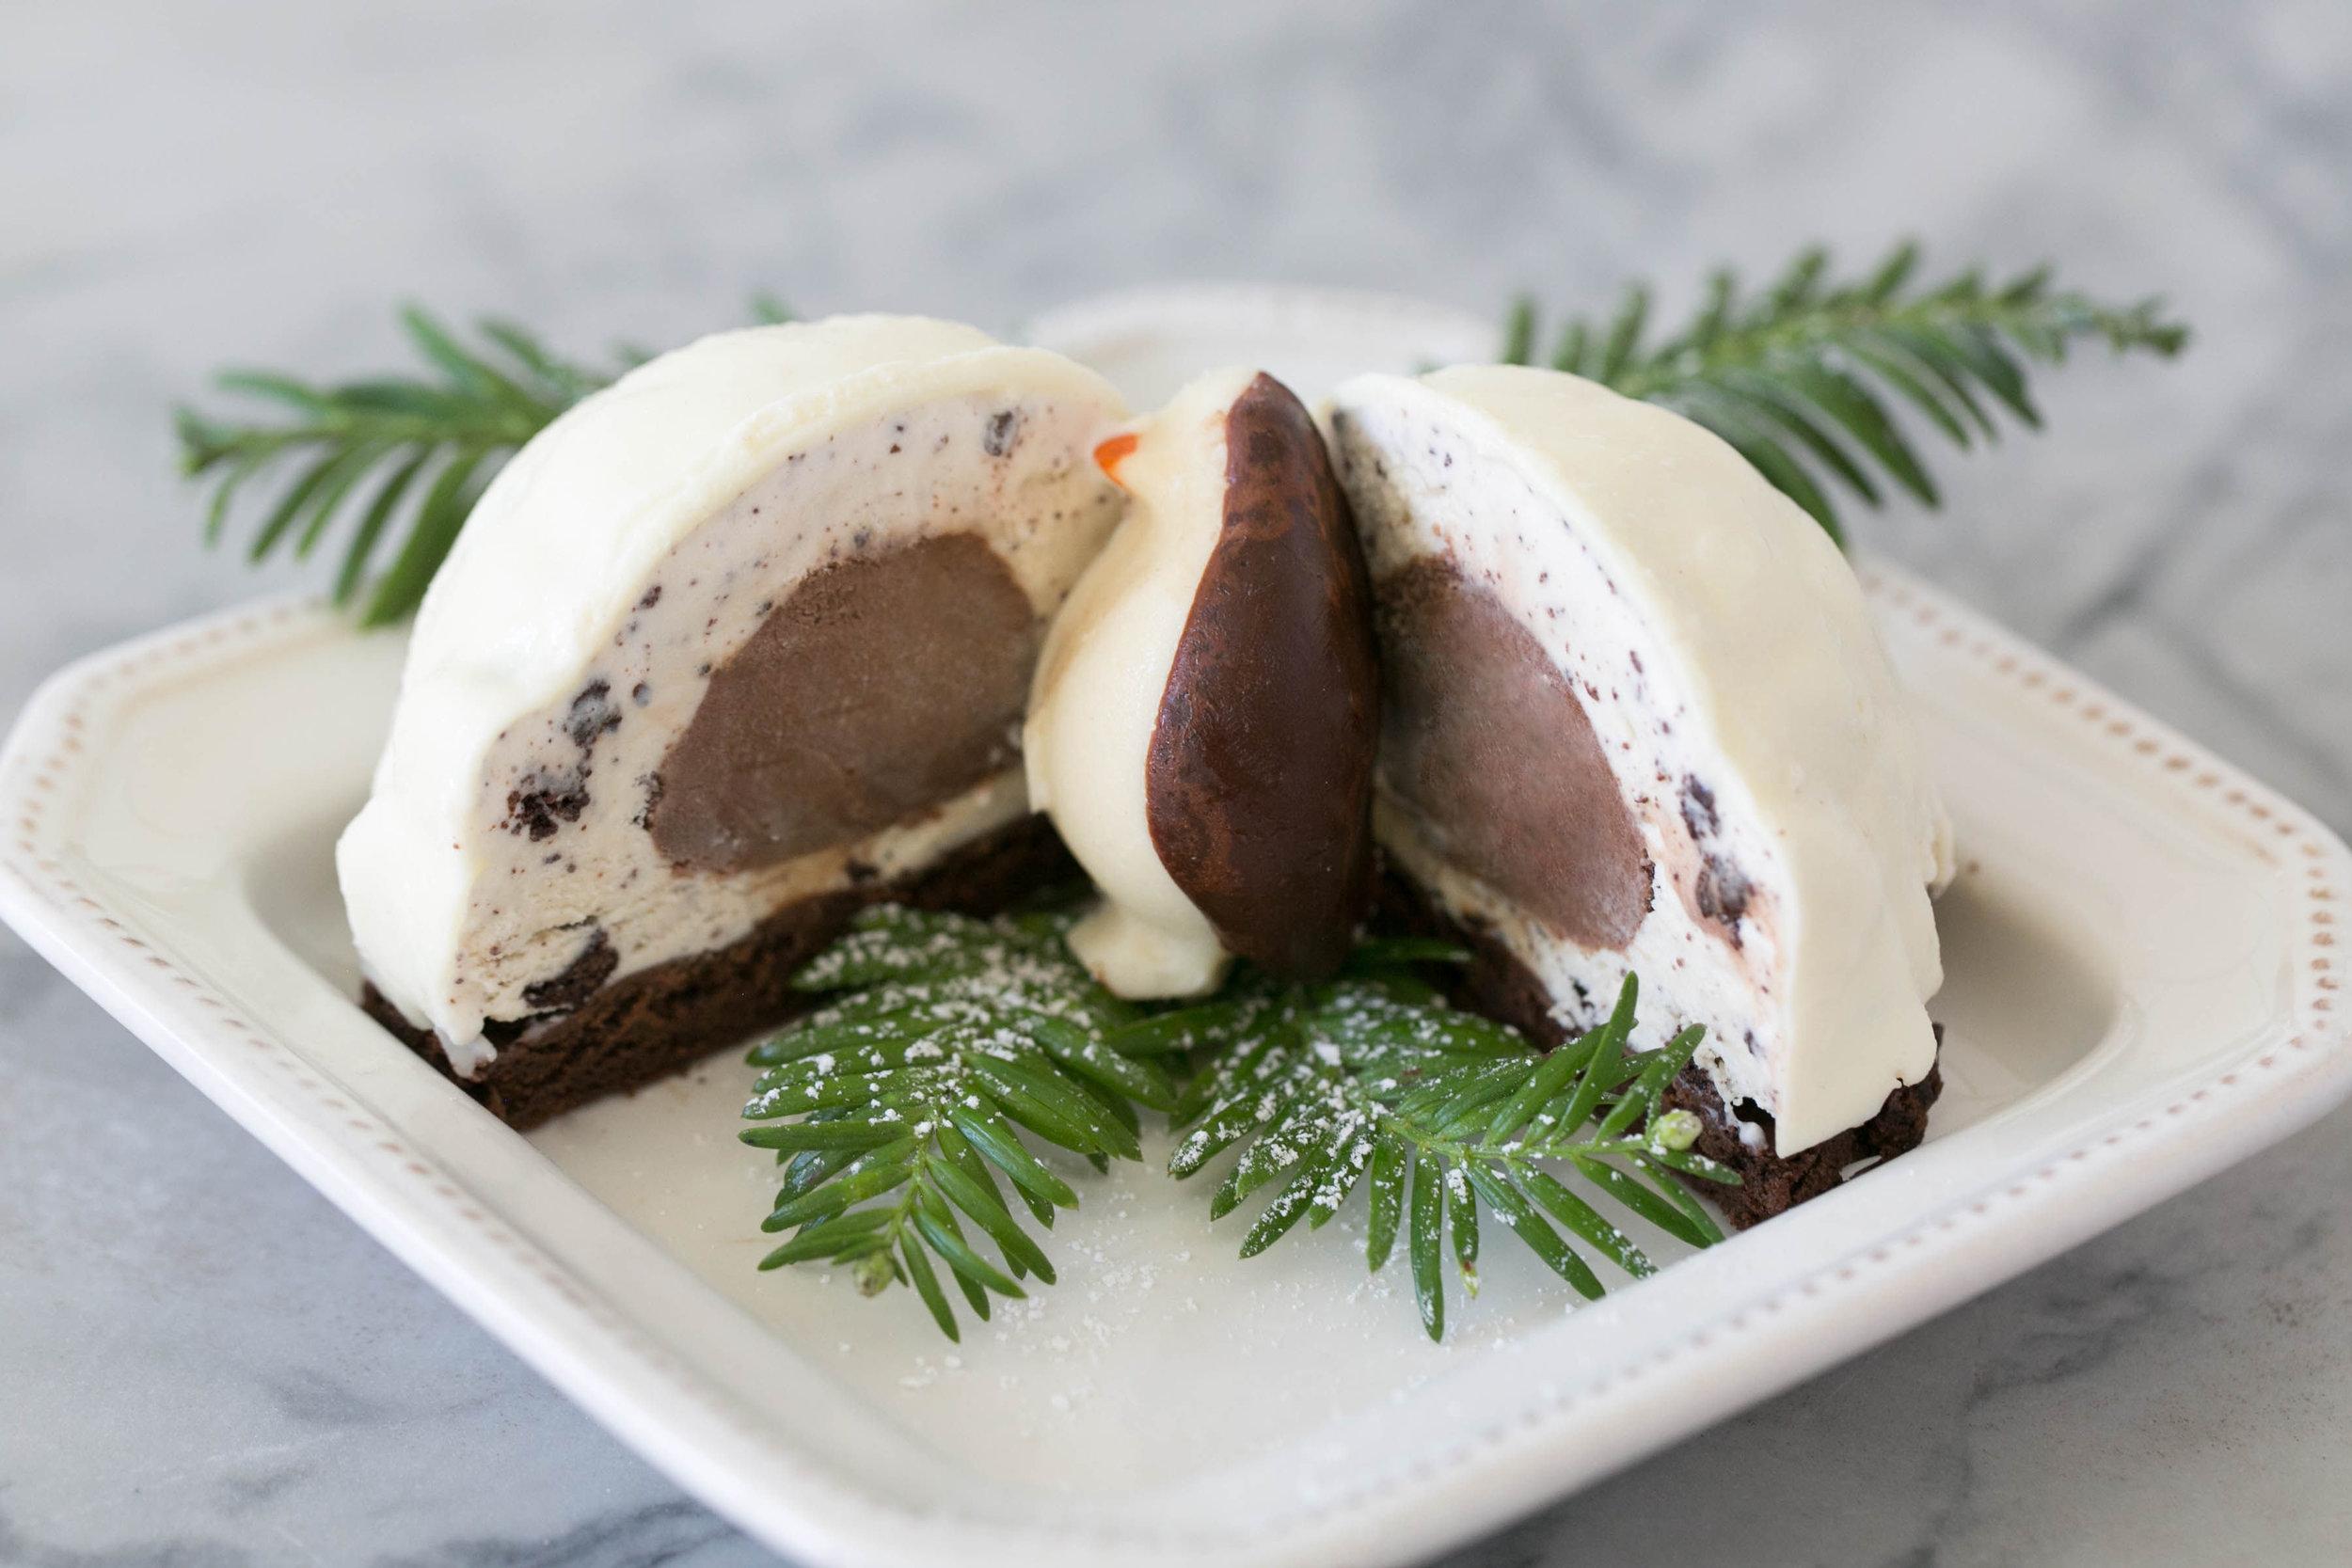 Gluten free ice cream igloo